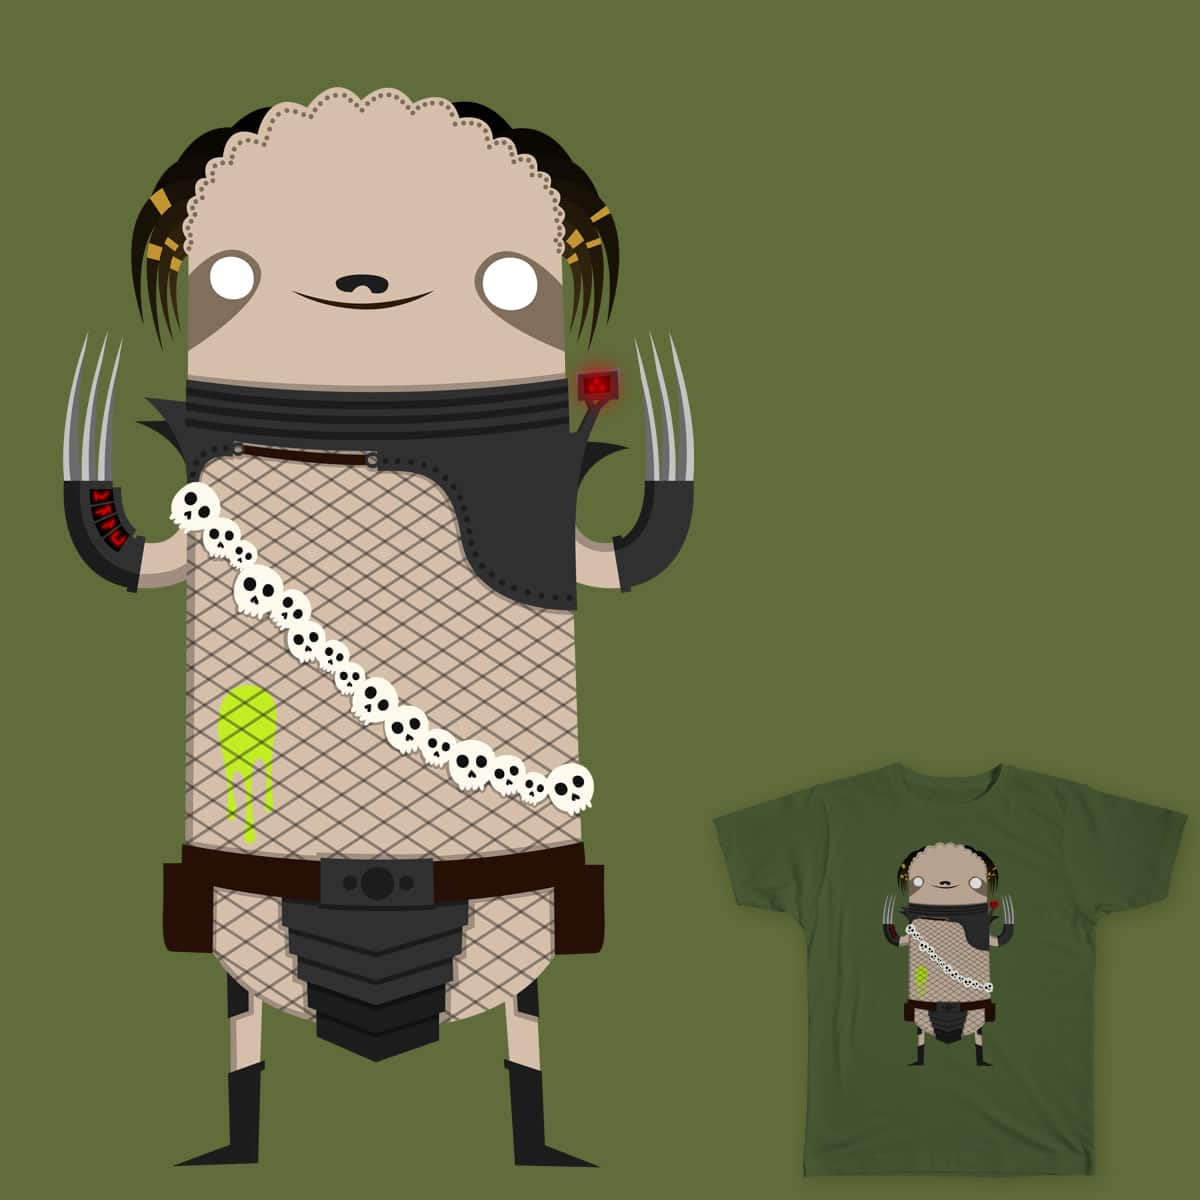 Predator Sloth by BakusPT on Threadless